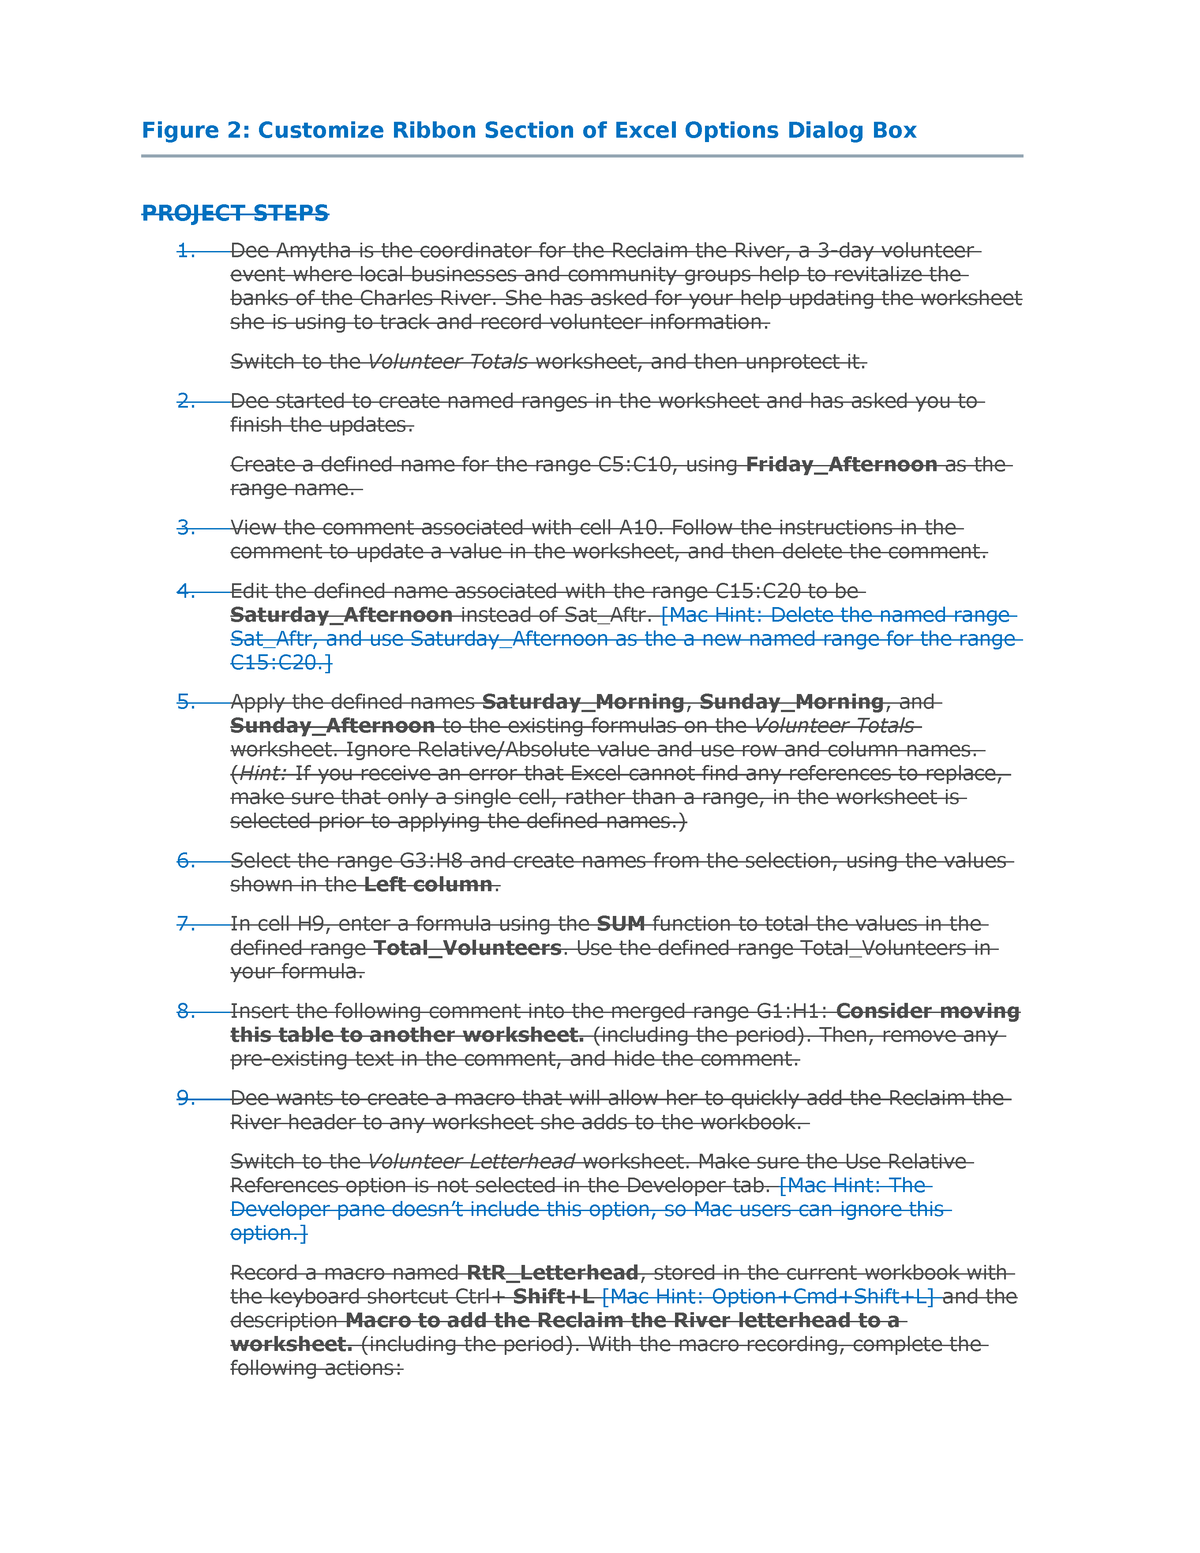 Instructions NP EX16 7a - FIN 3000: Principles Of Finance - StuDocu